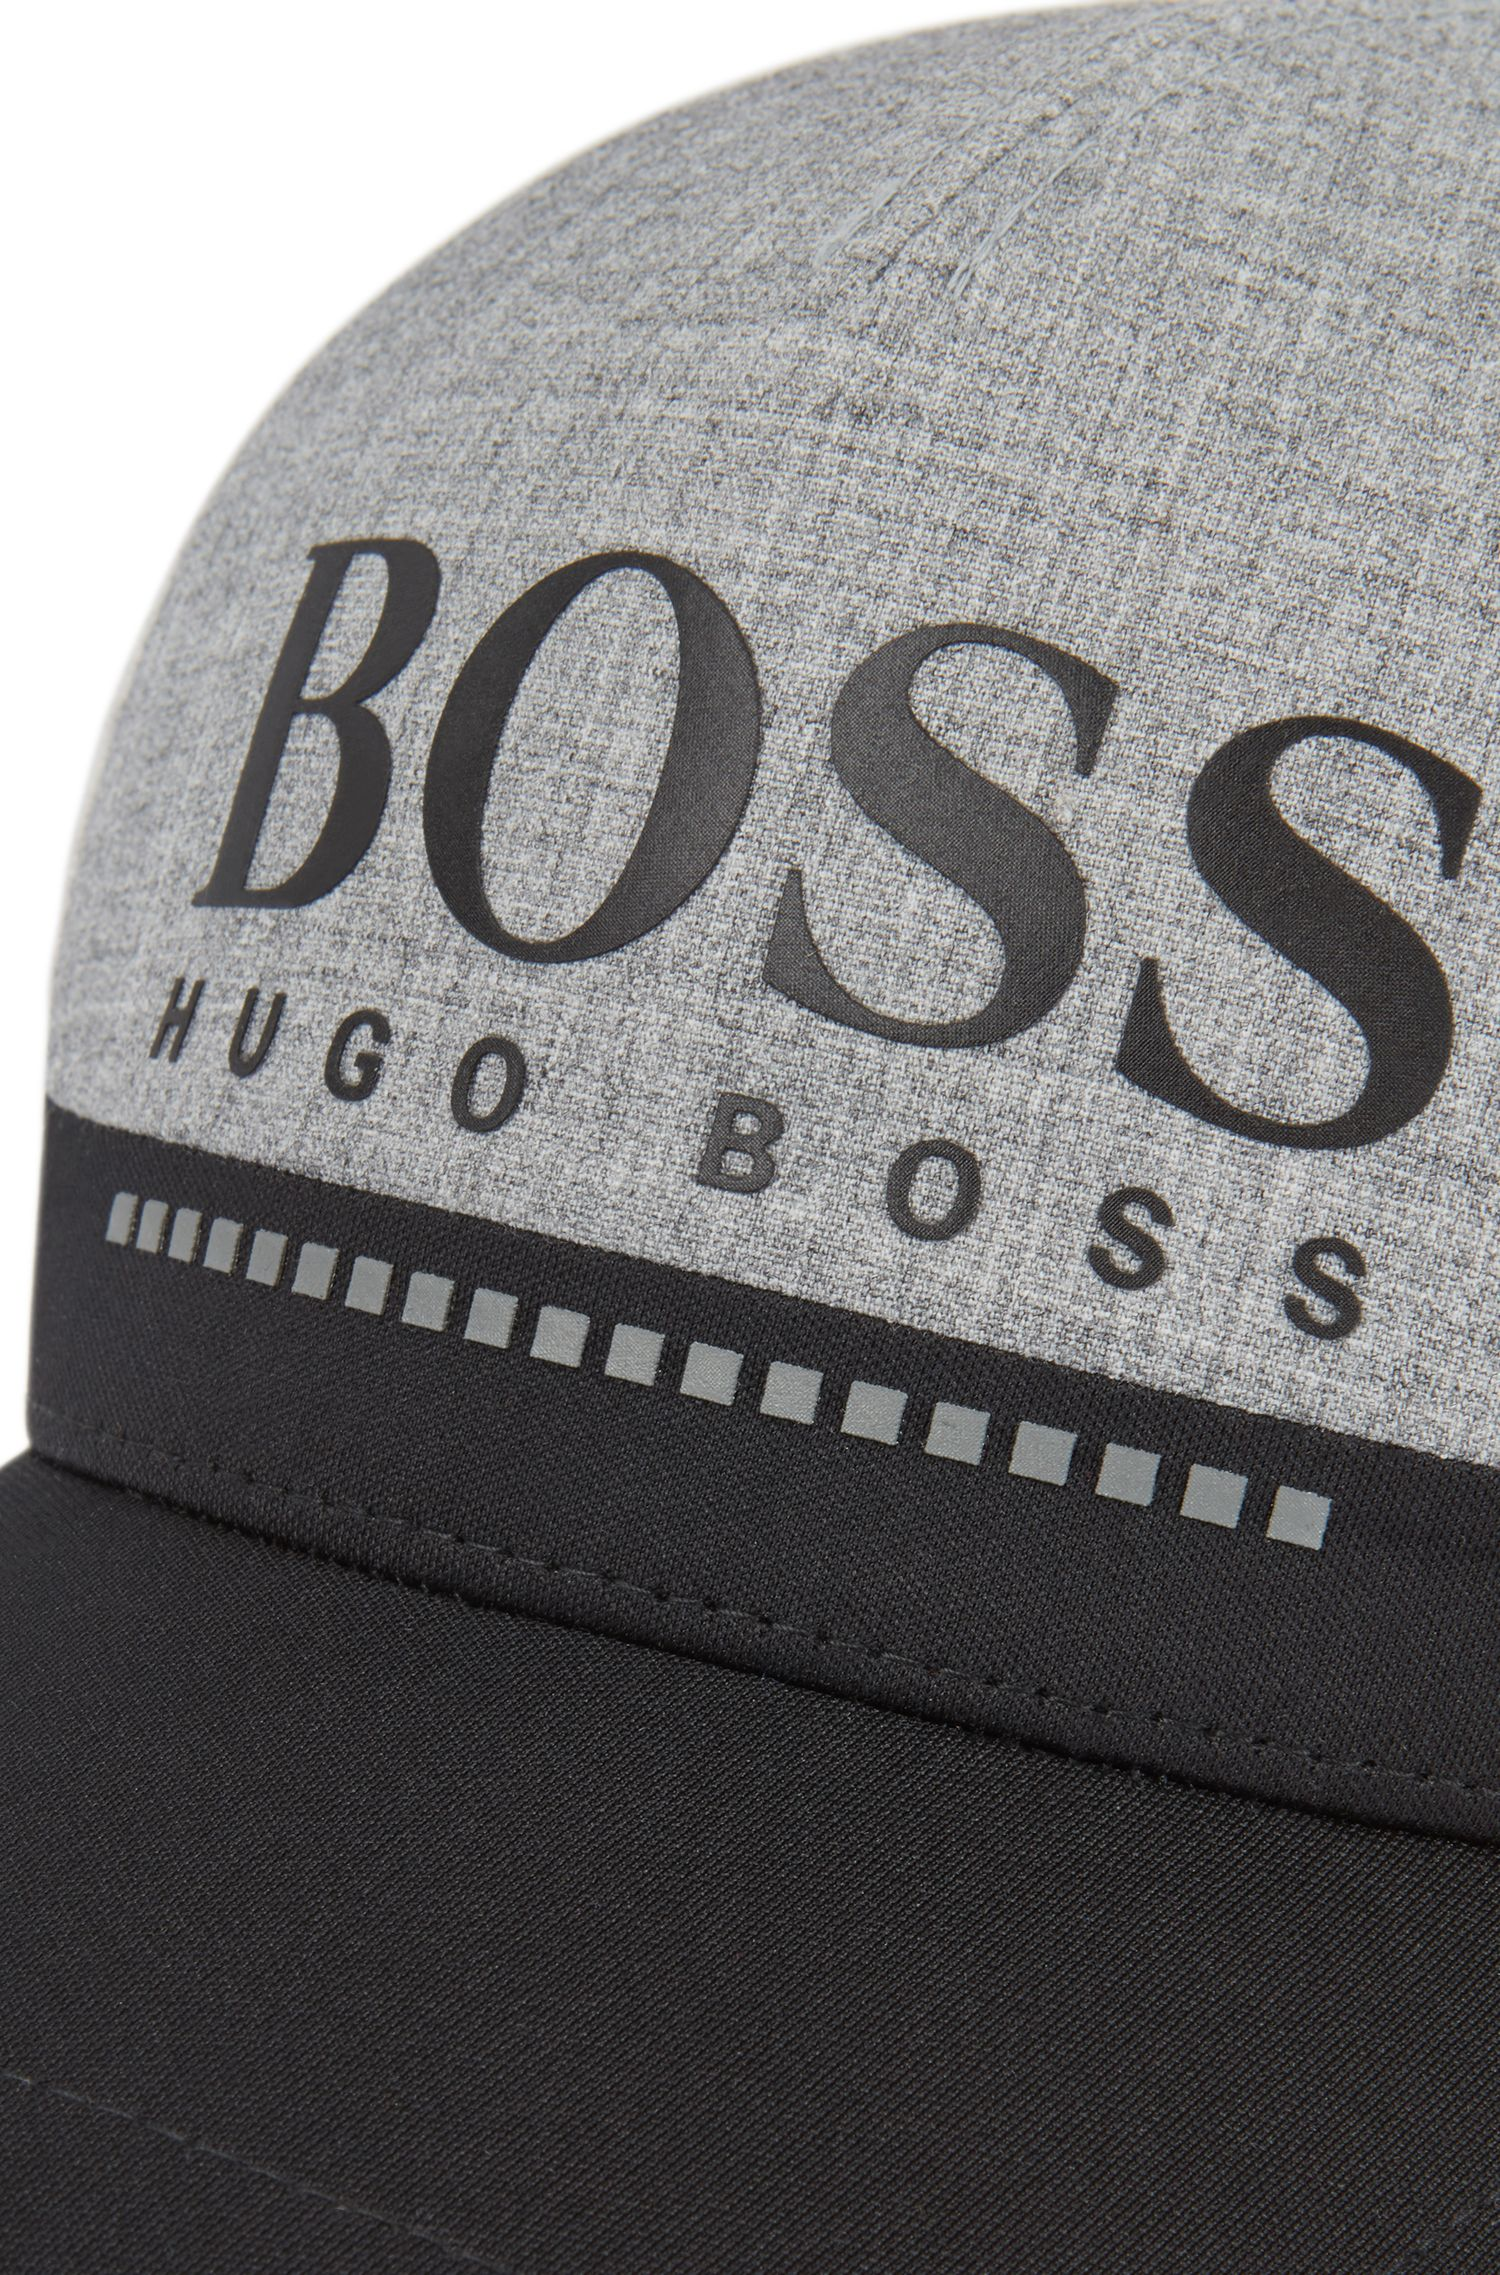 Rubber-print logo cap in technical melange jersey, Light Grey